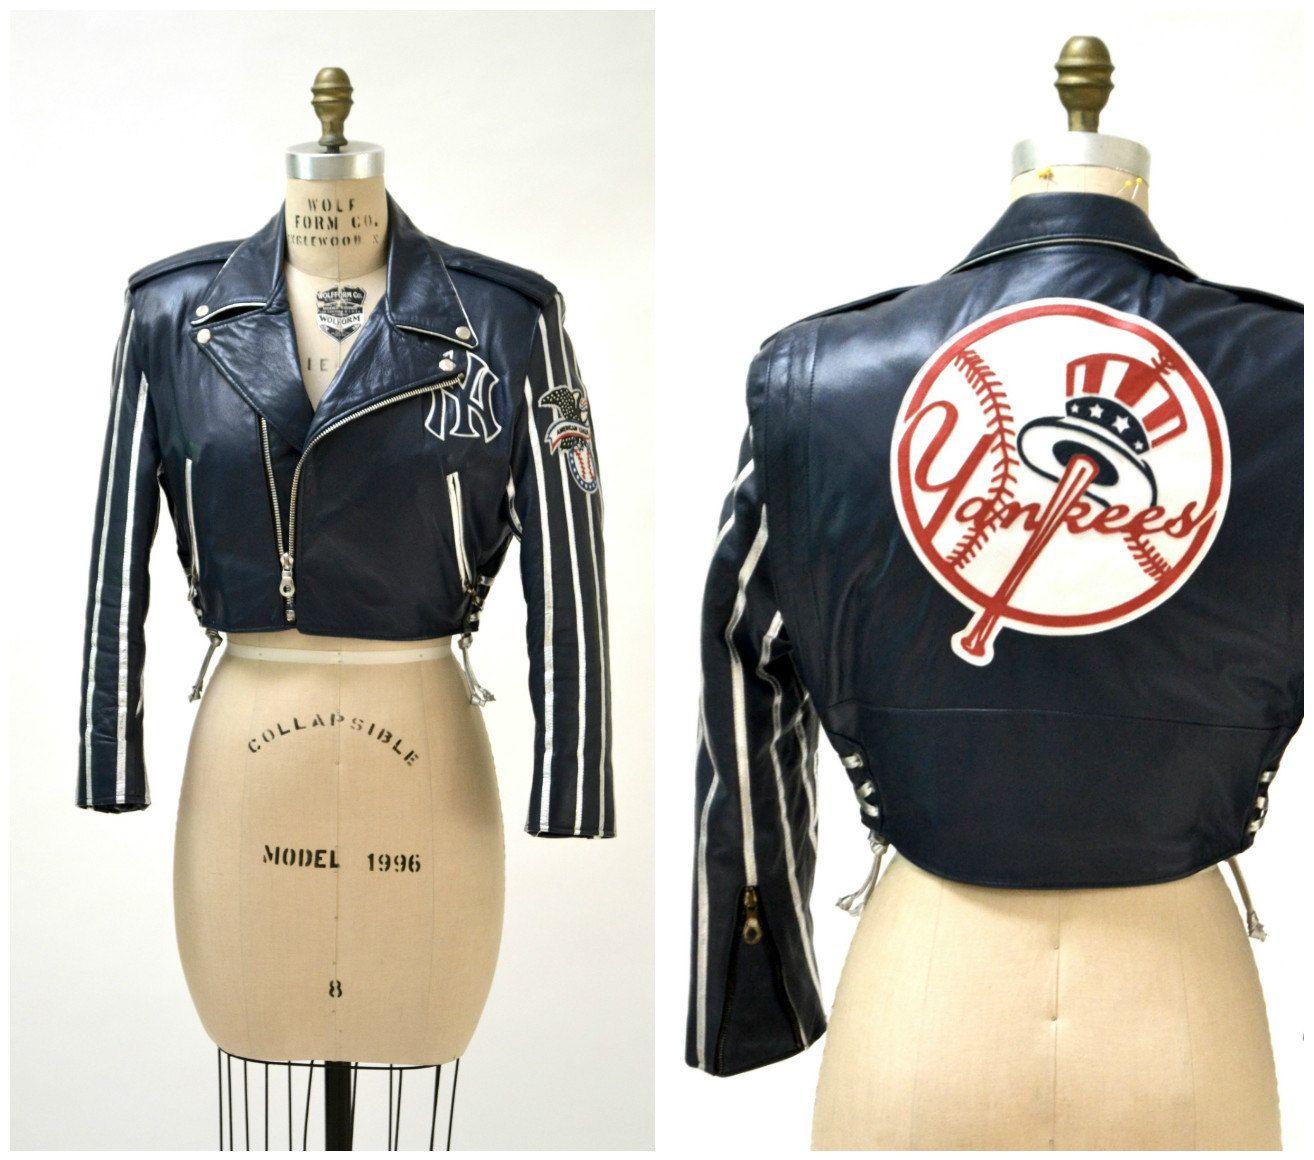 Vintage Leather Jacket New York Yankees Motorcycle Jacket By Etsy Vintage Leather Jacket Beautiful Jacket Vintage Leather [ 1160 x 1314 Pixel ]